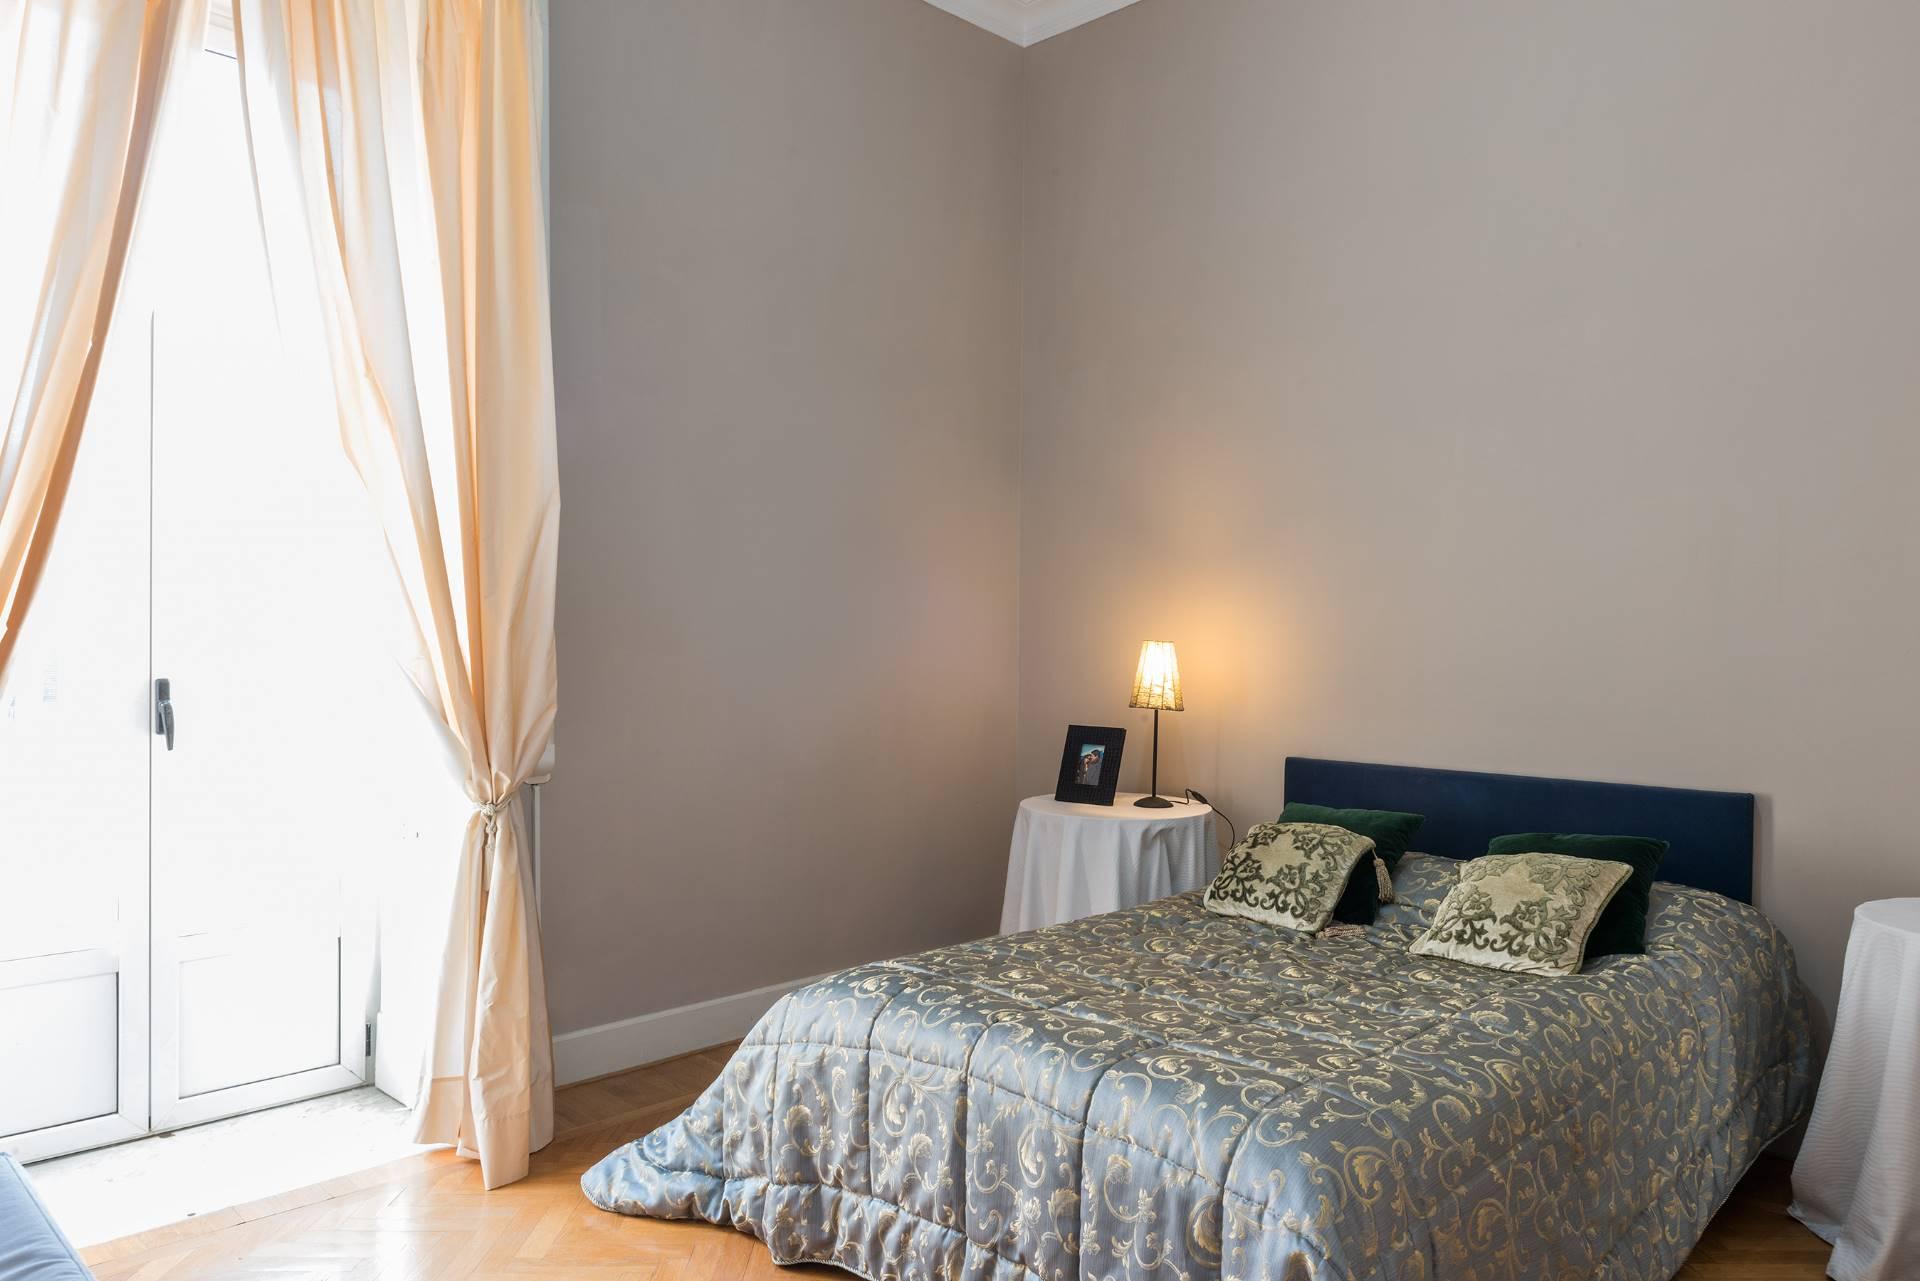 Stylish apartment with seaviews - 19